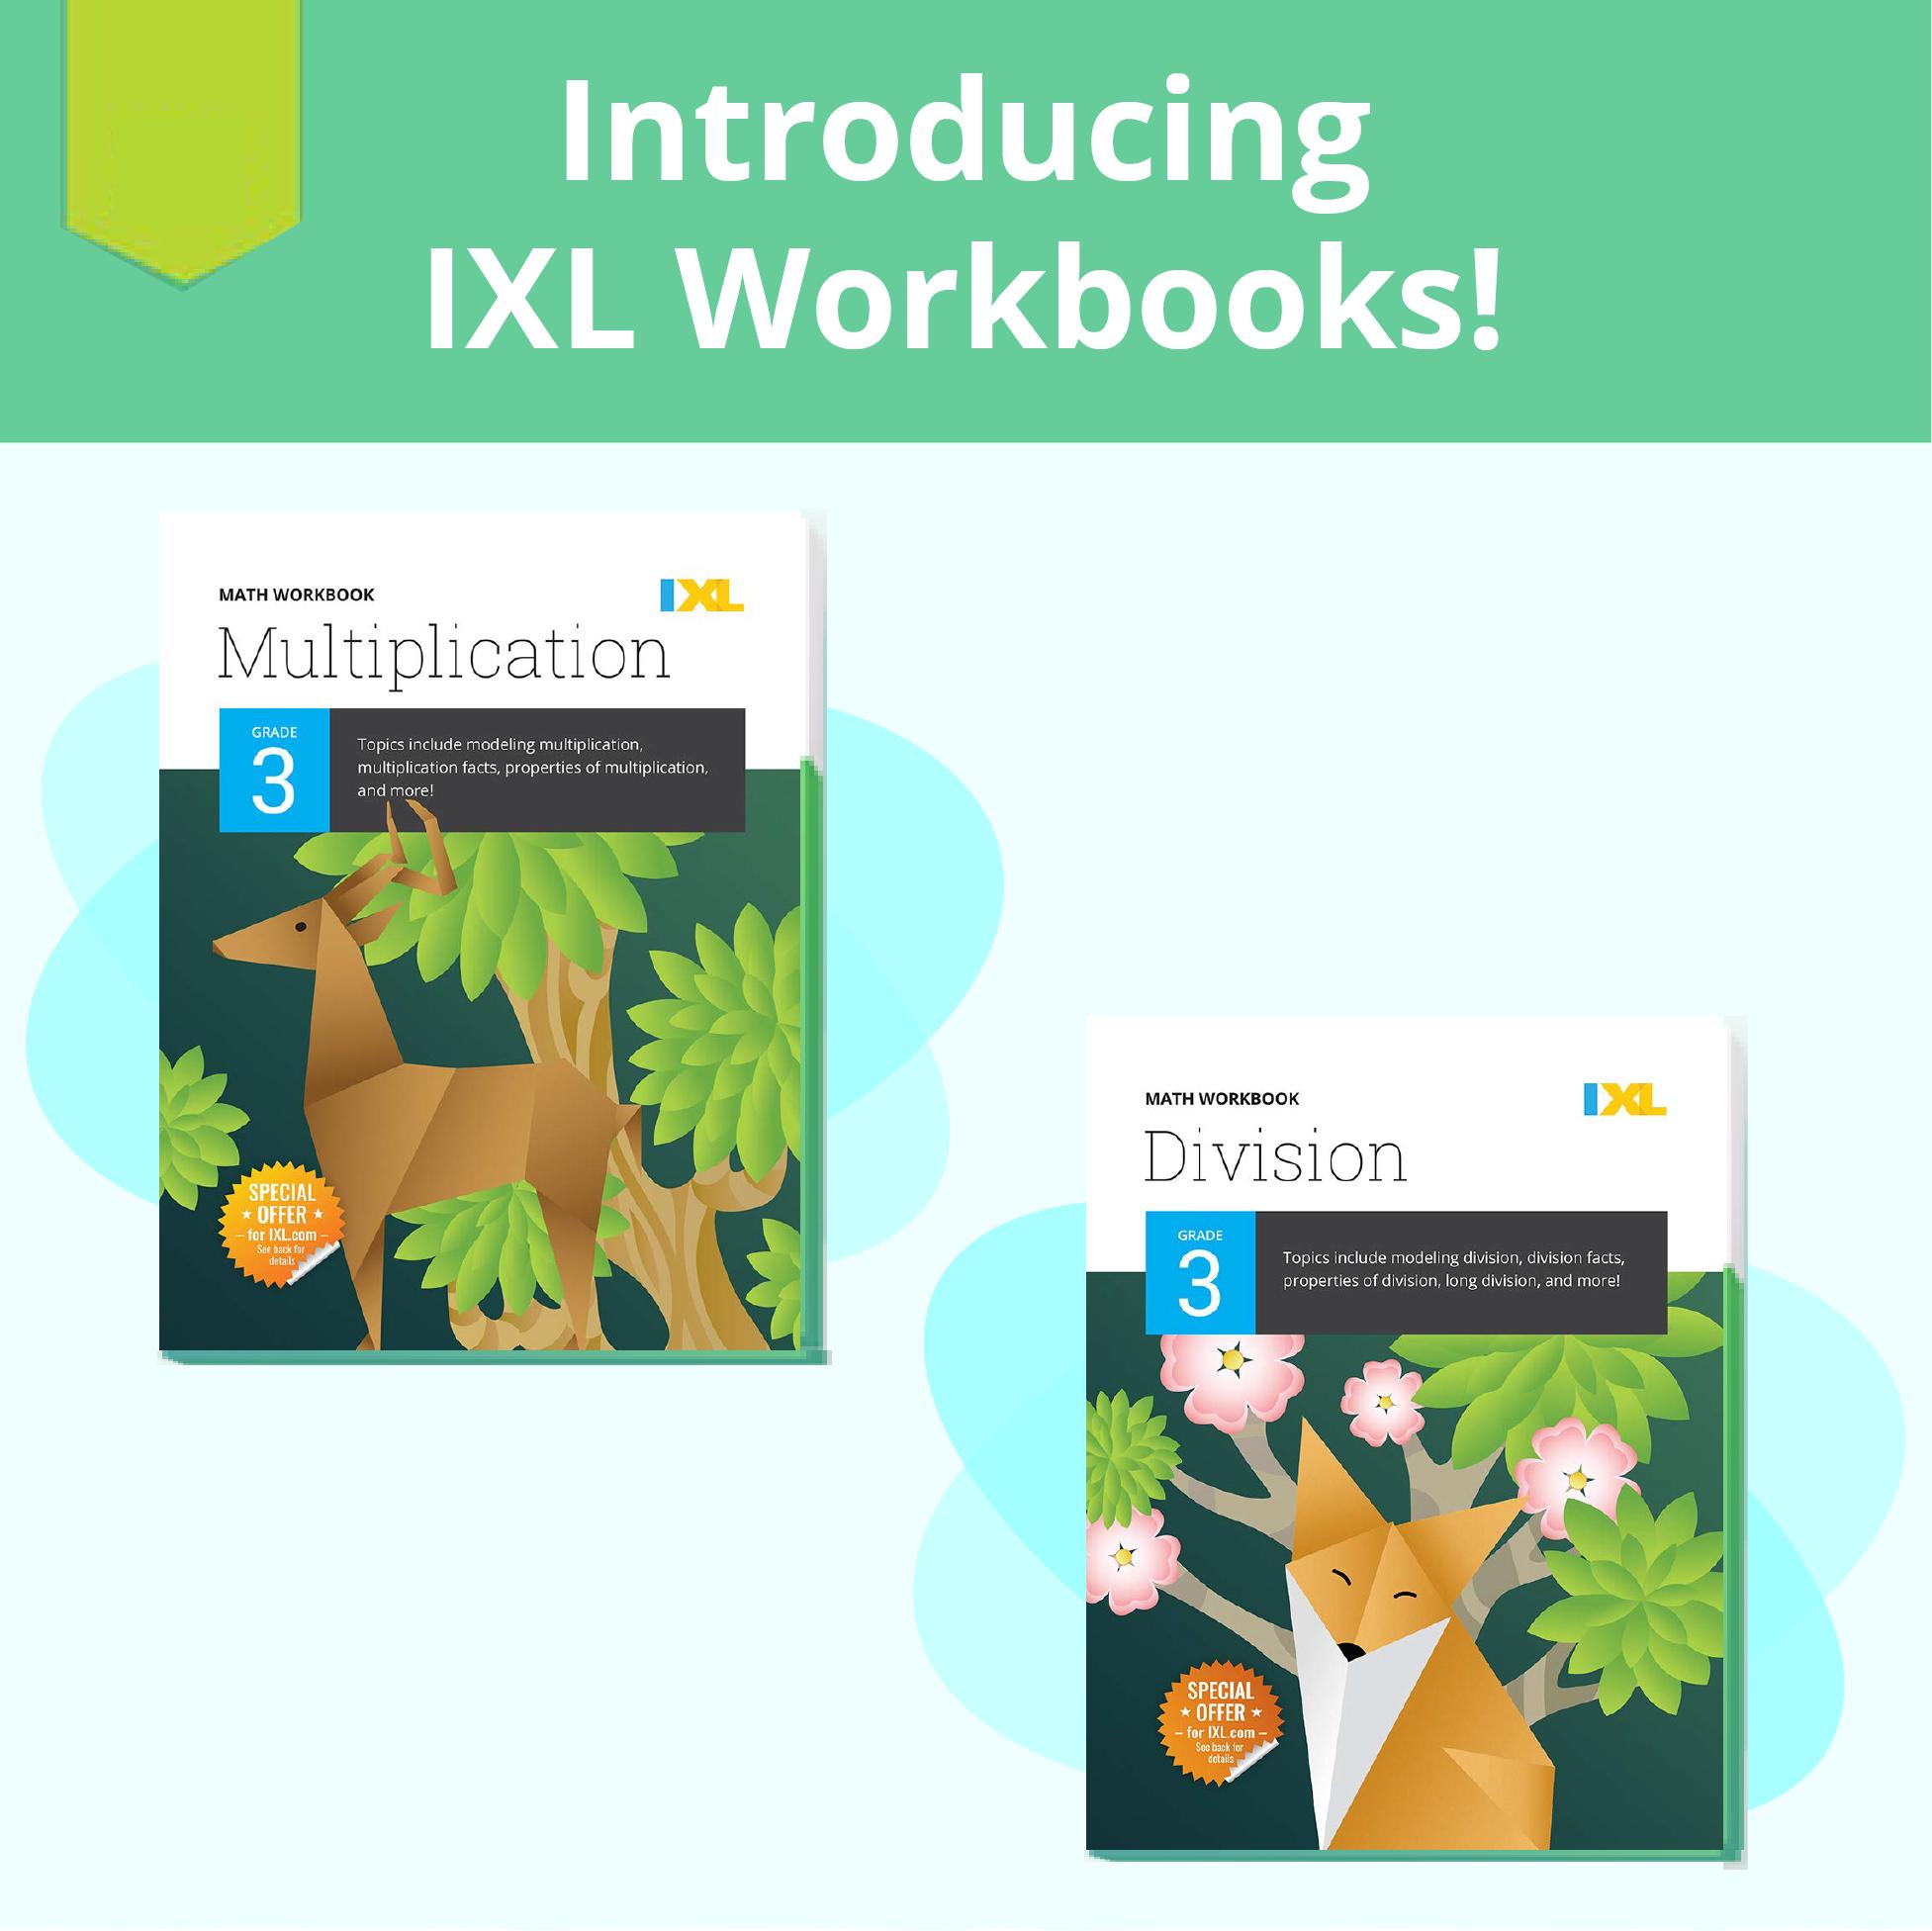 Introducing IXL workbooks